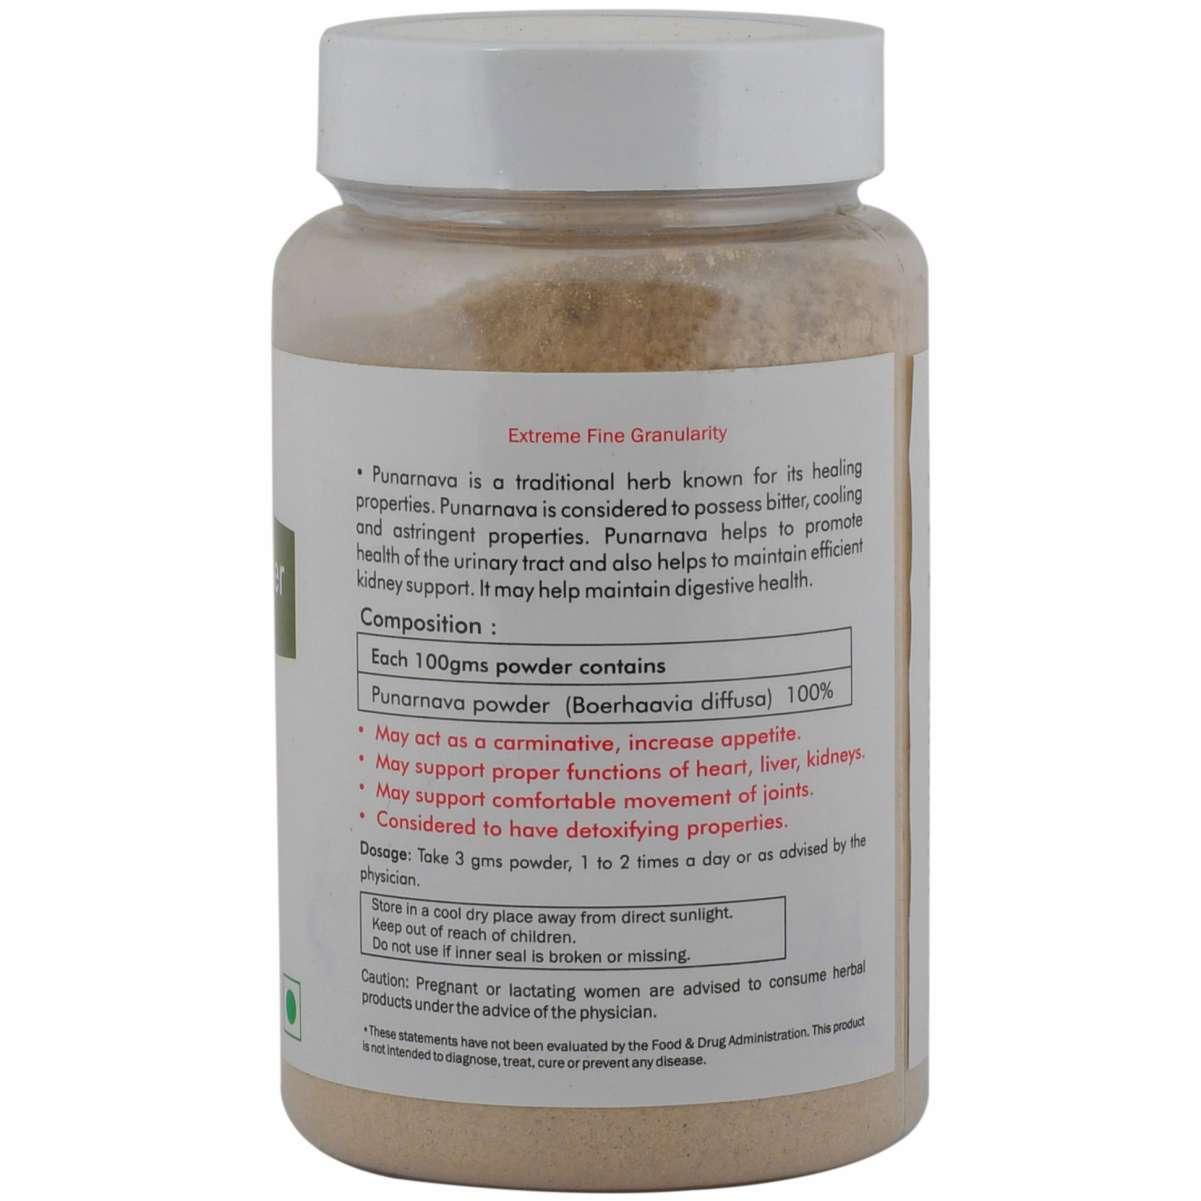 Ayurvedic Punarnava Powder 100gm for Kidney & Prostate health (Pack of 2)